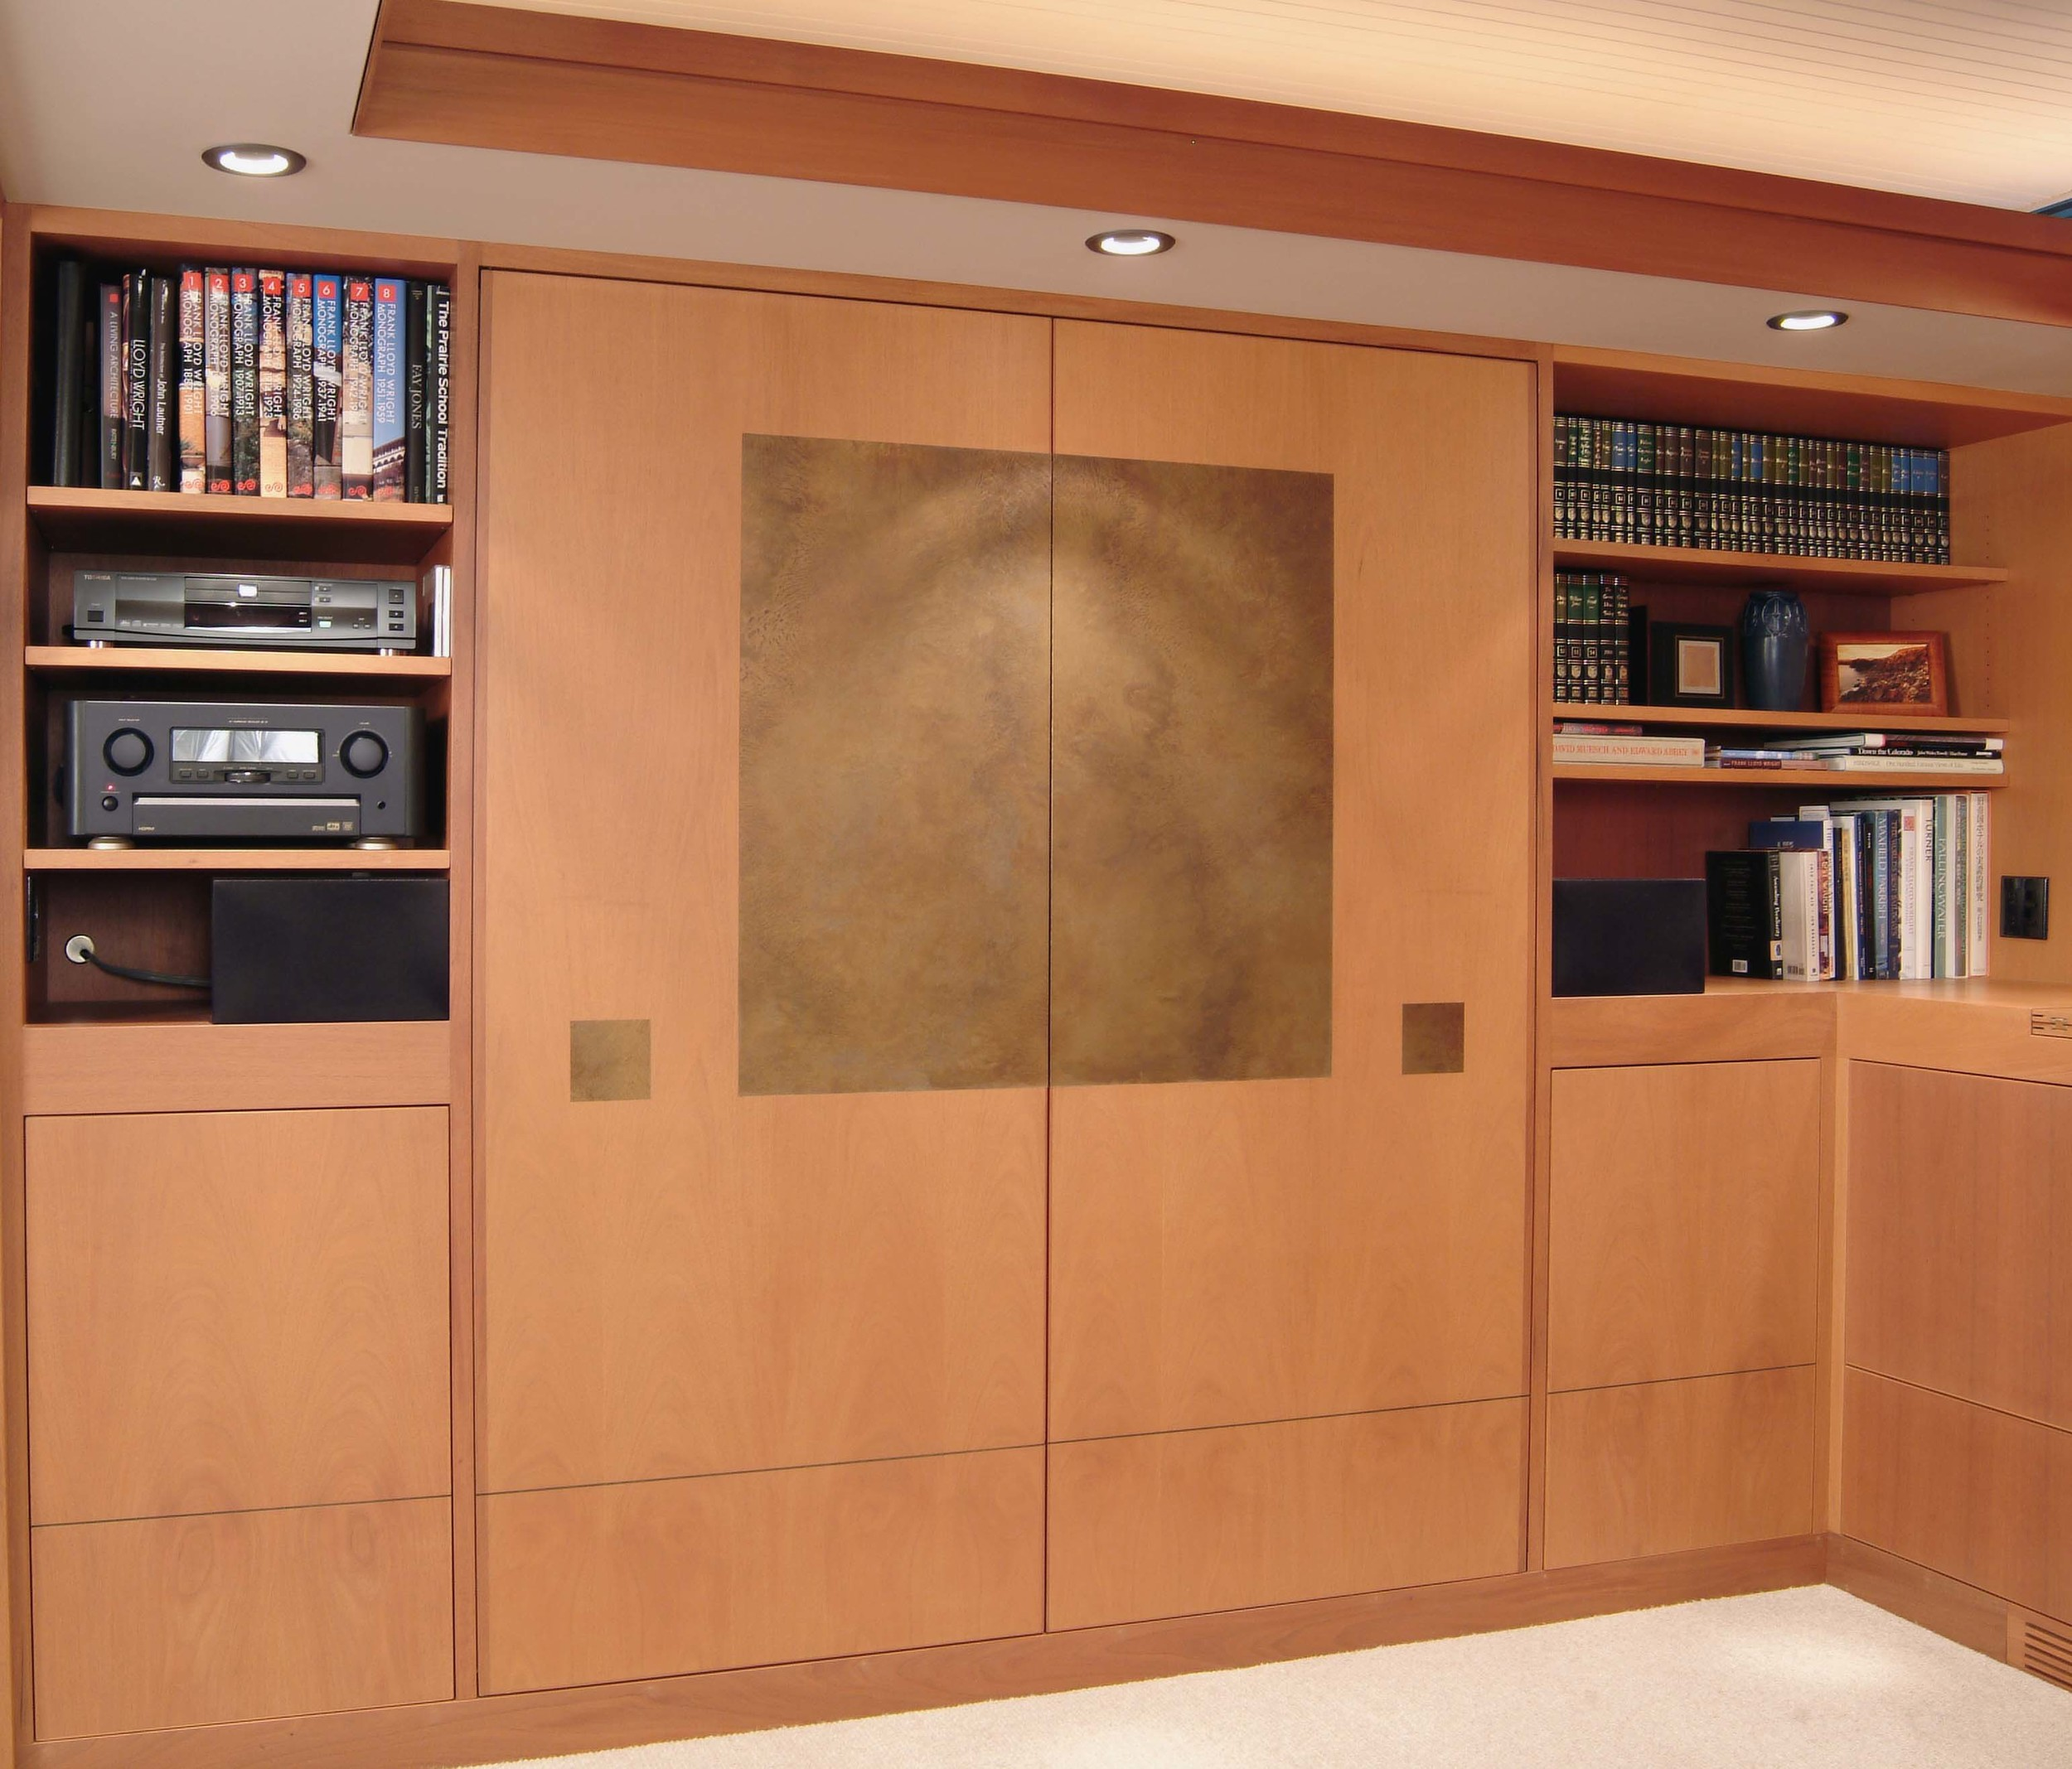 stollermetals-Cabinets 1.jpg